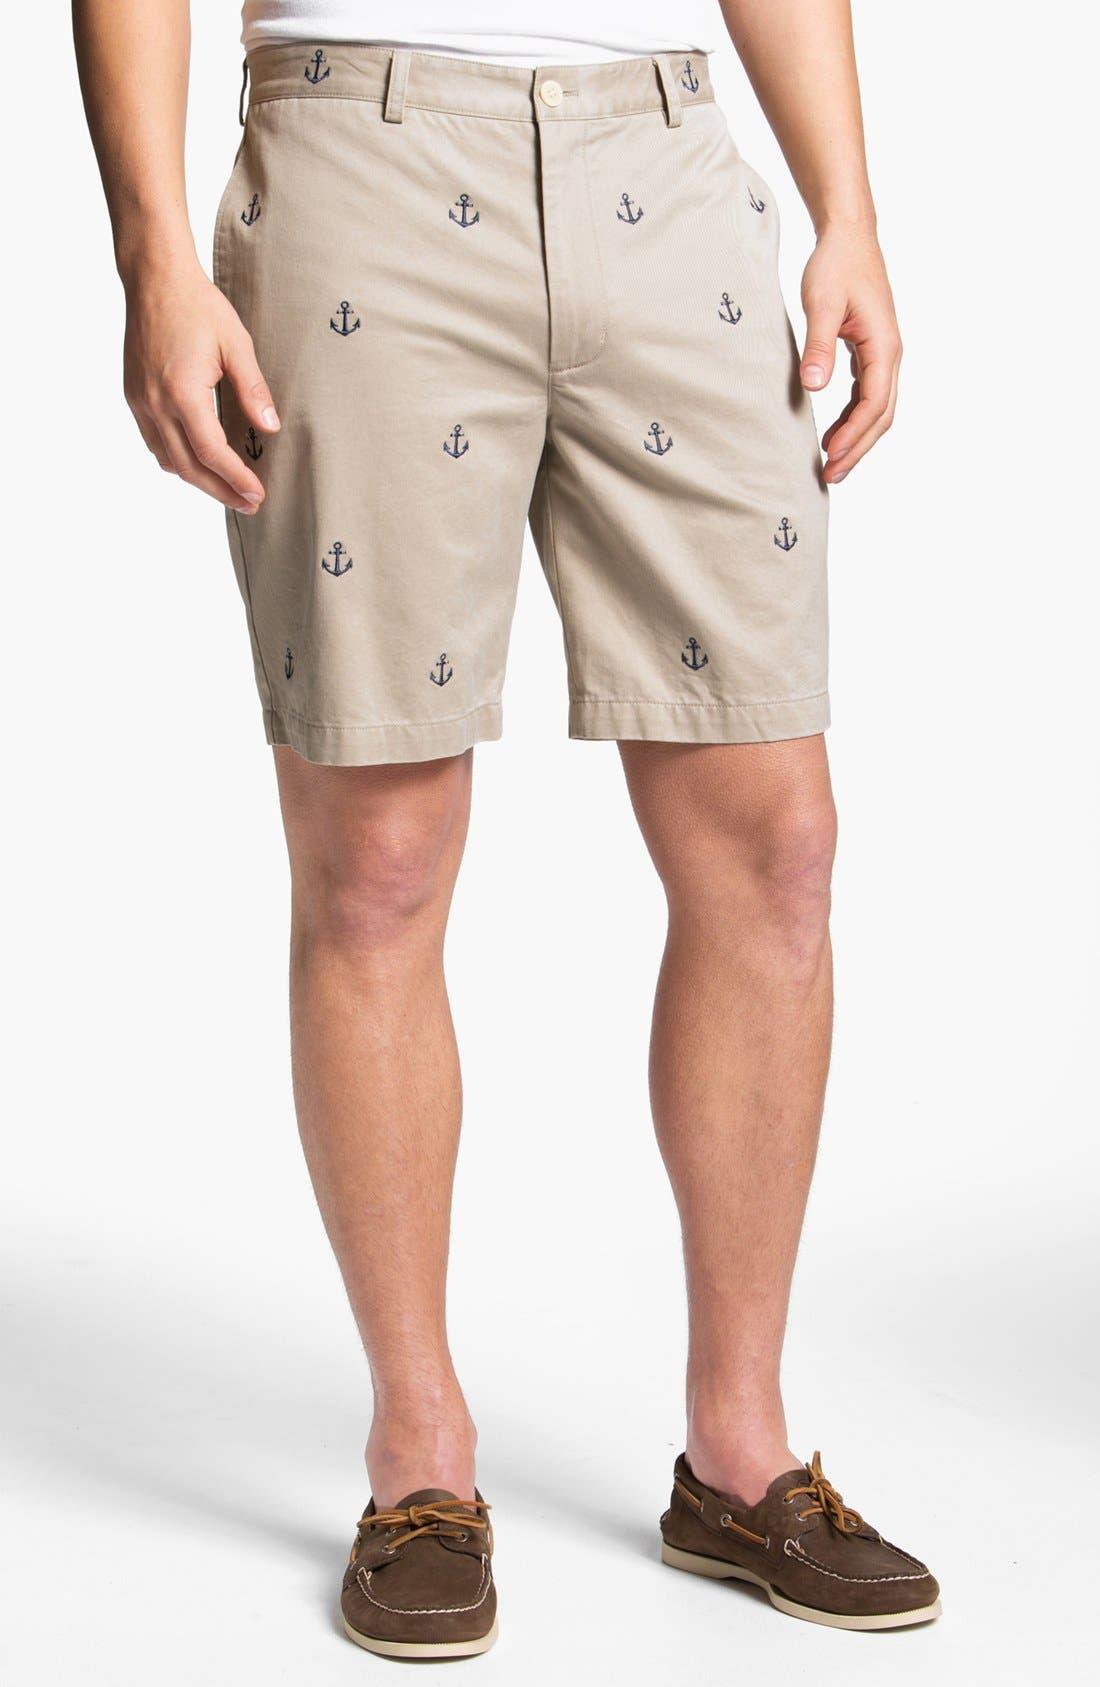 Main Image - Vineyard Vines 'Embroidered Anchor' Shorts